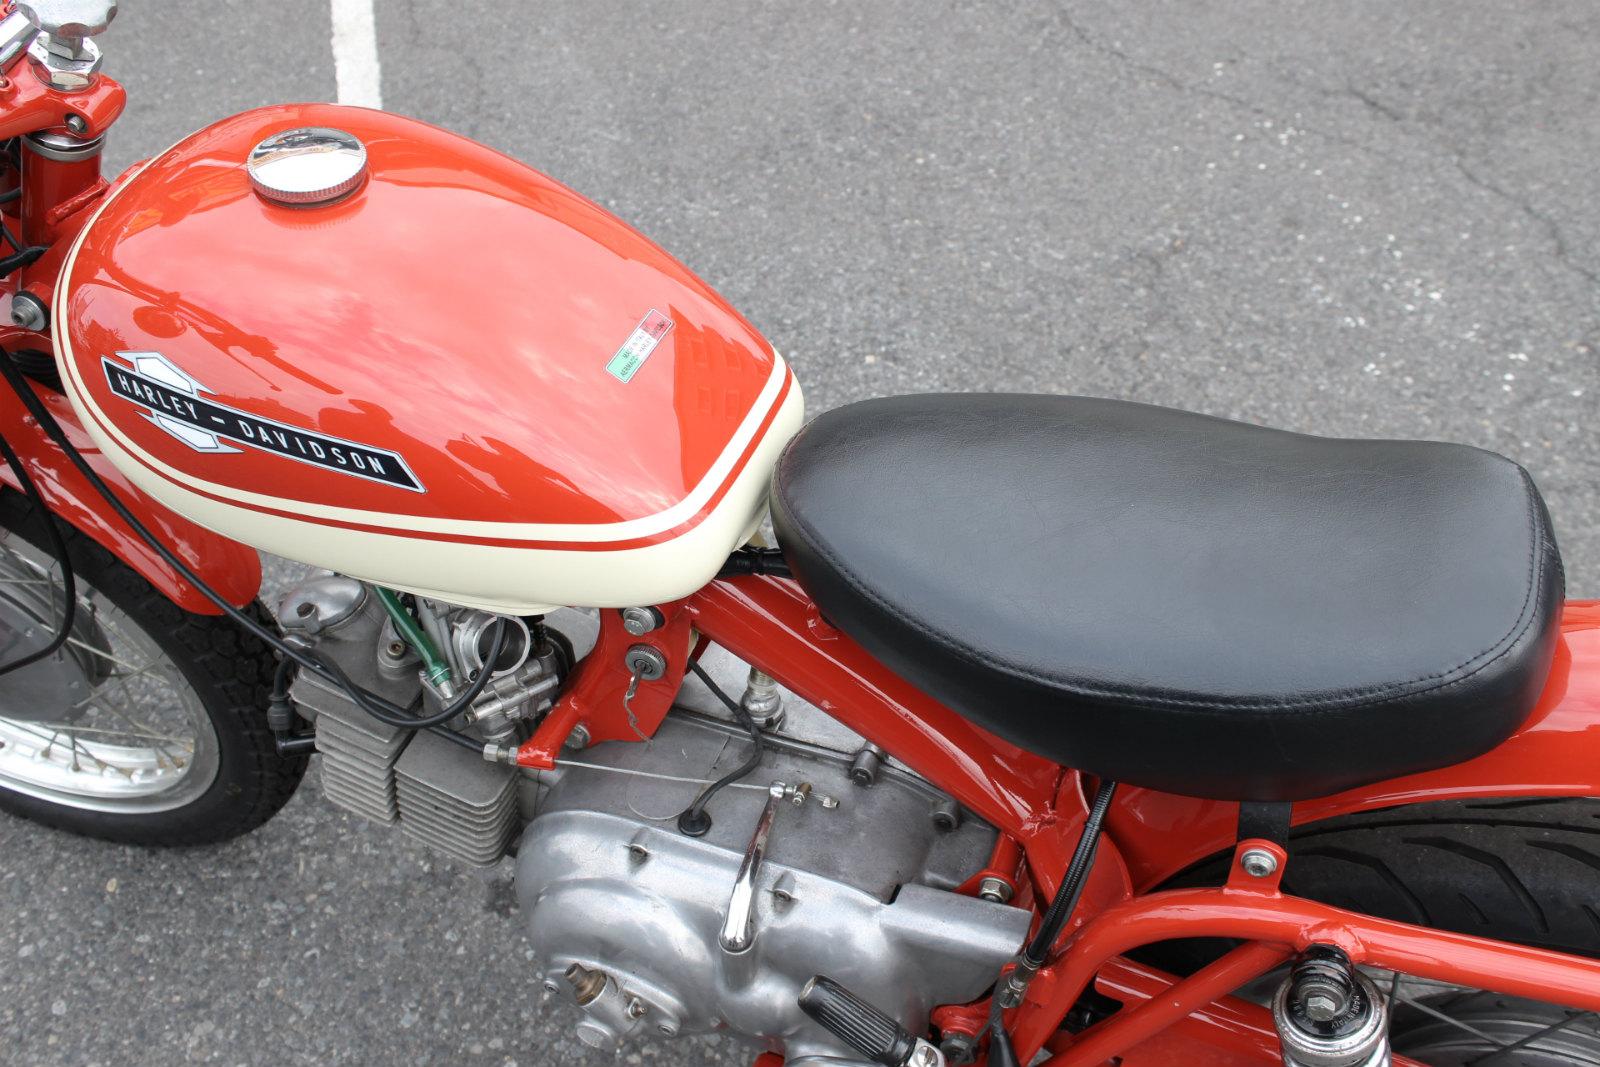 Harley Davidson Sprint_a0208987_14131619.jpg